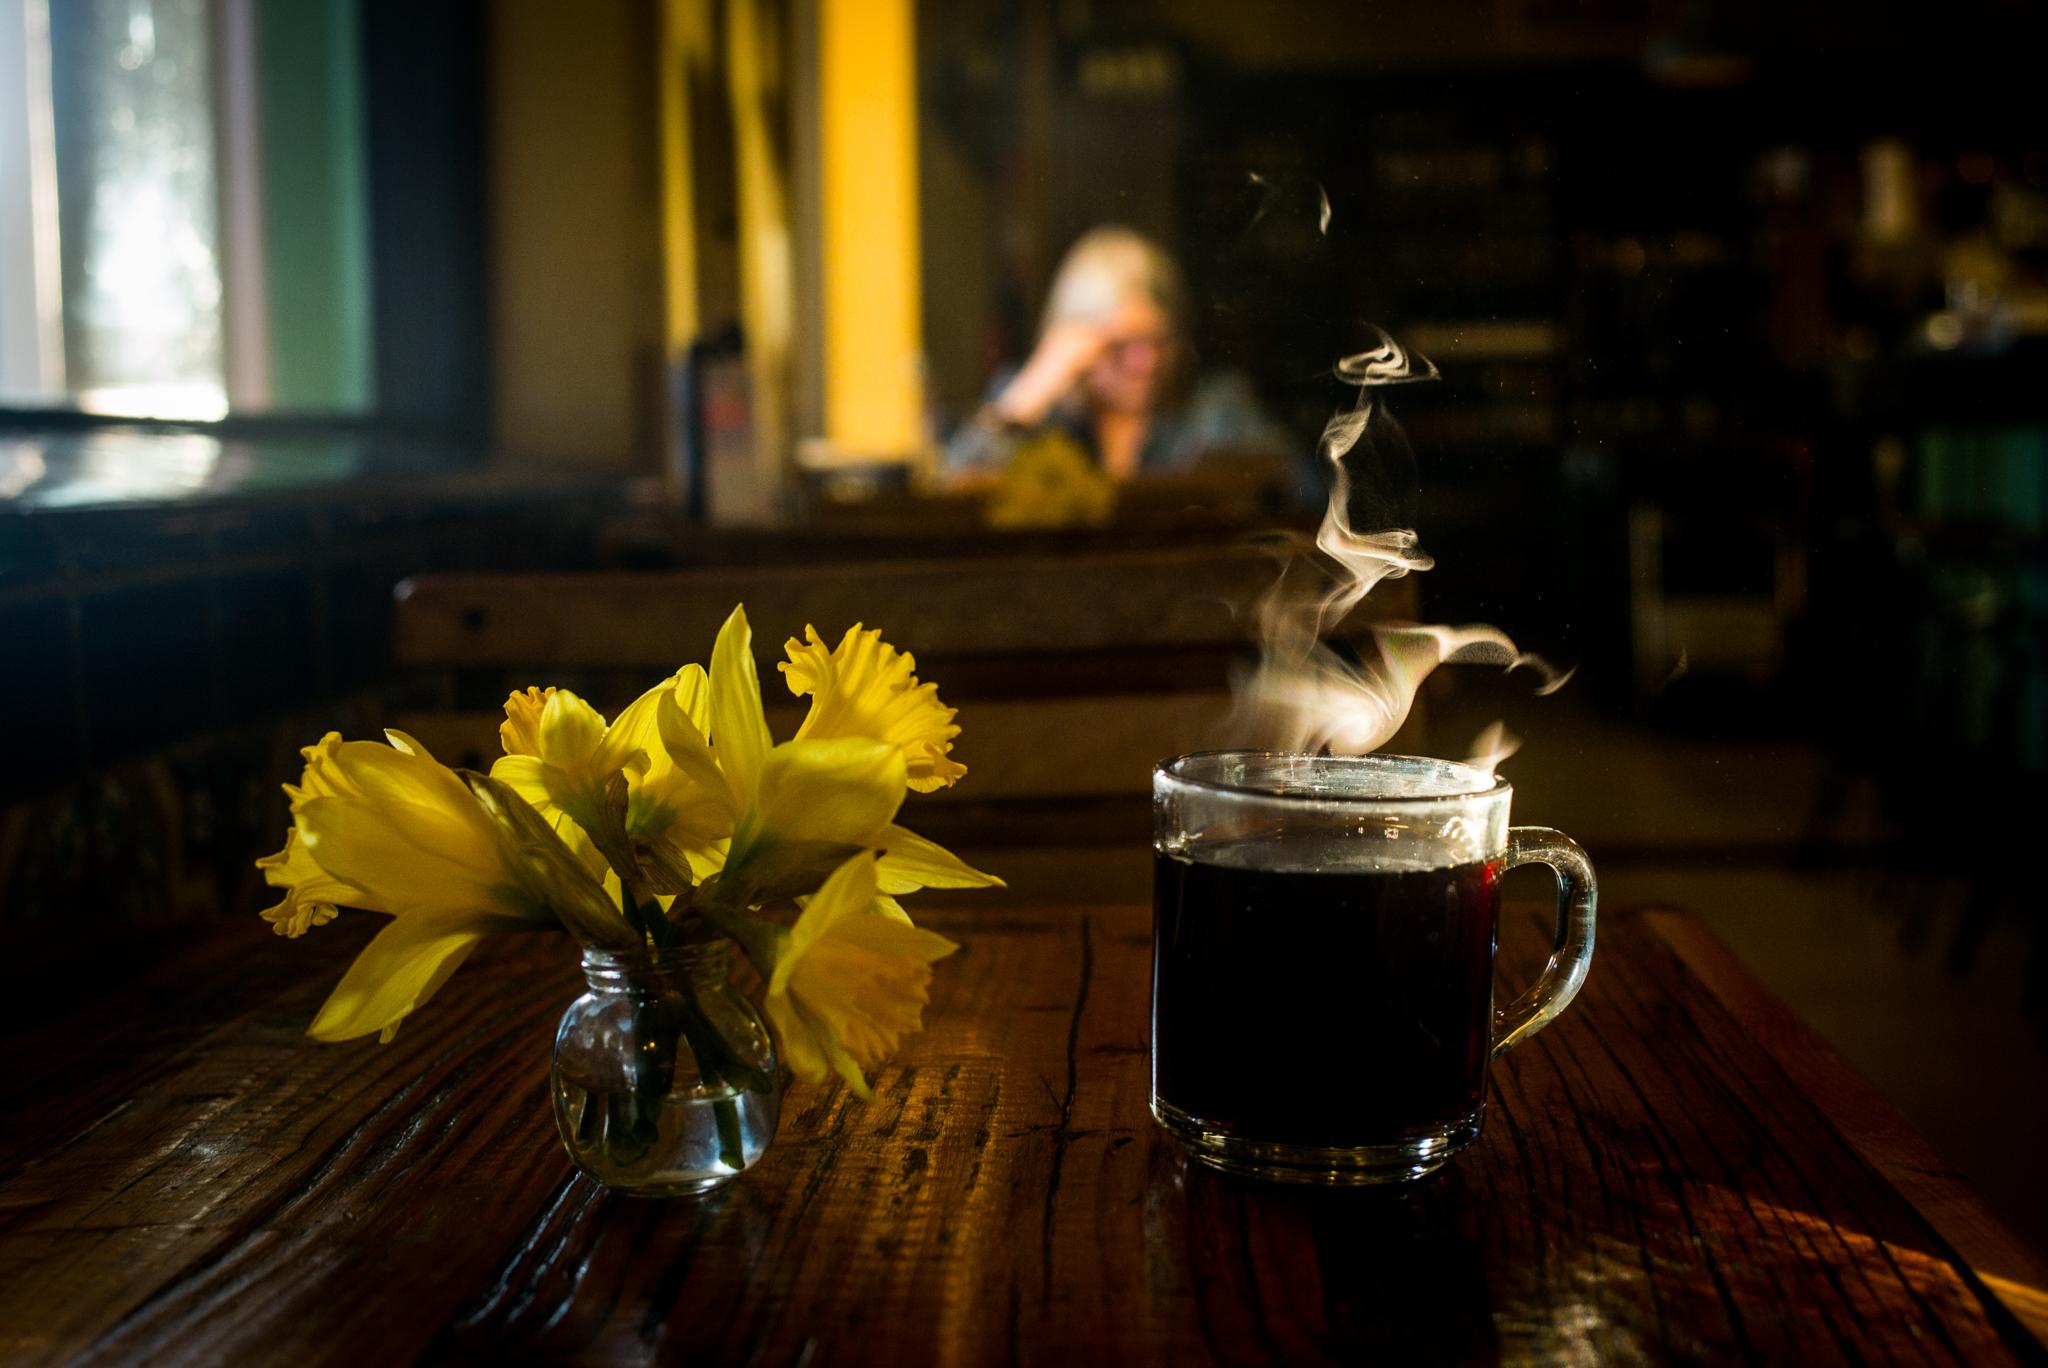 Morning coffee, Tucson, Arizona.  Leica M240, Leica 35mm f1.4 Summilux.